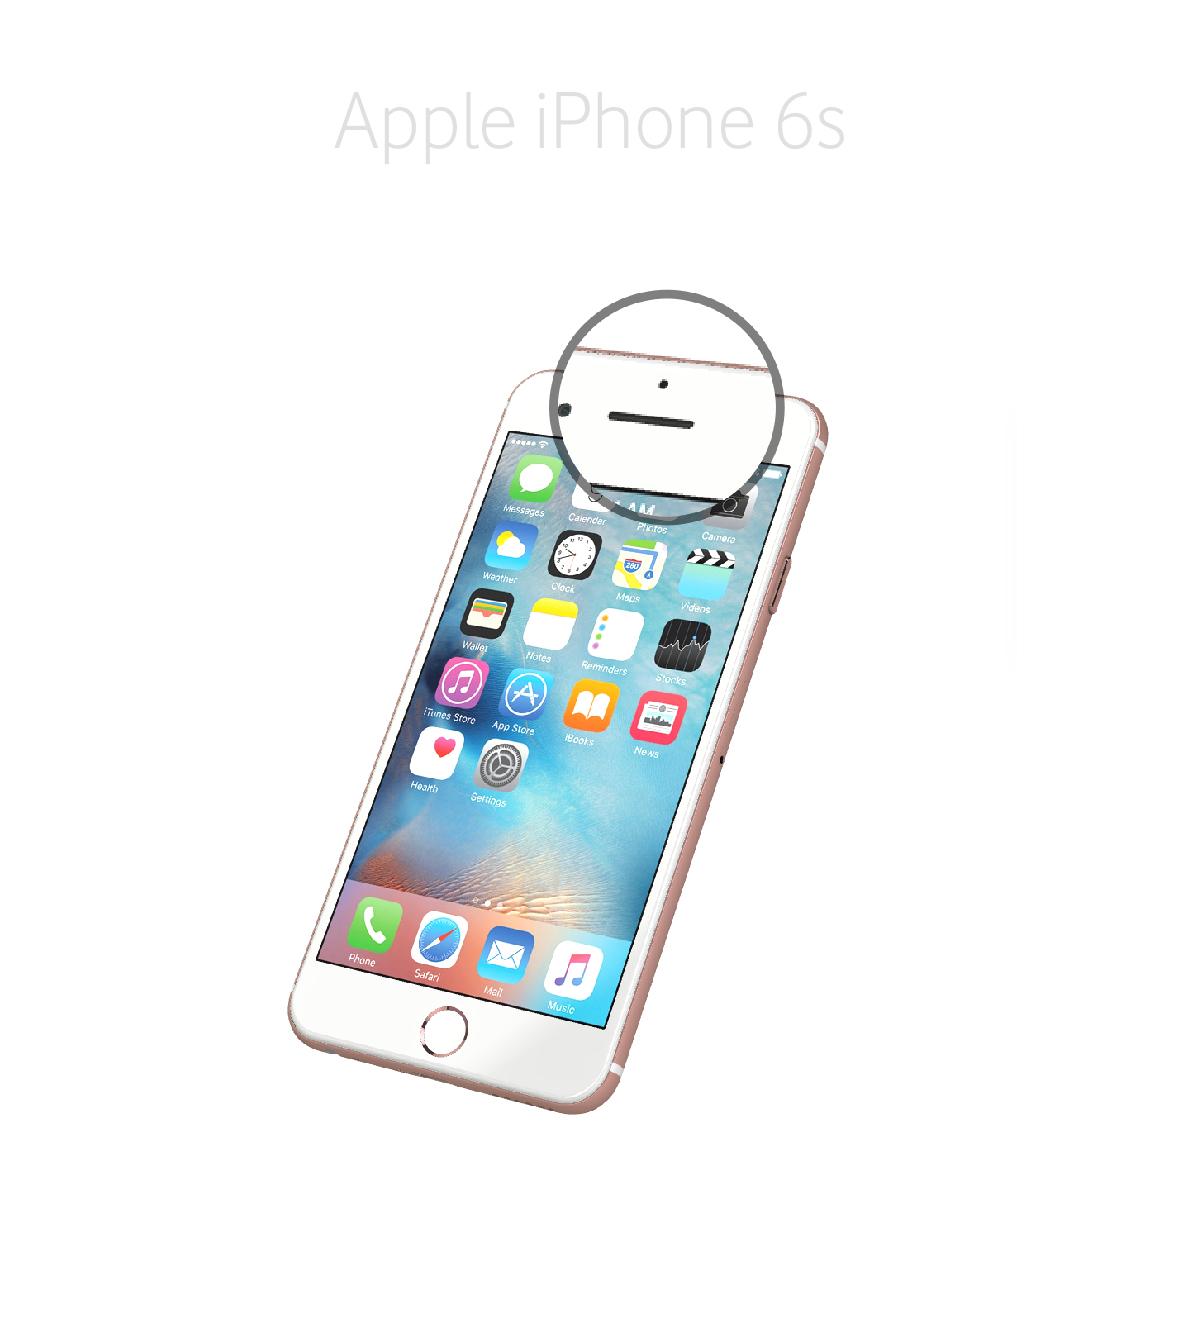 Laga samtalshögtalare iPhone 6s